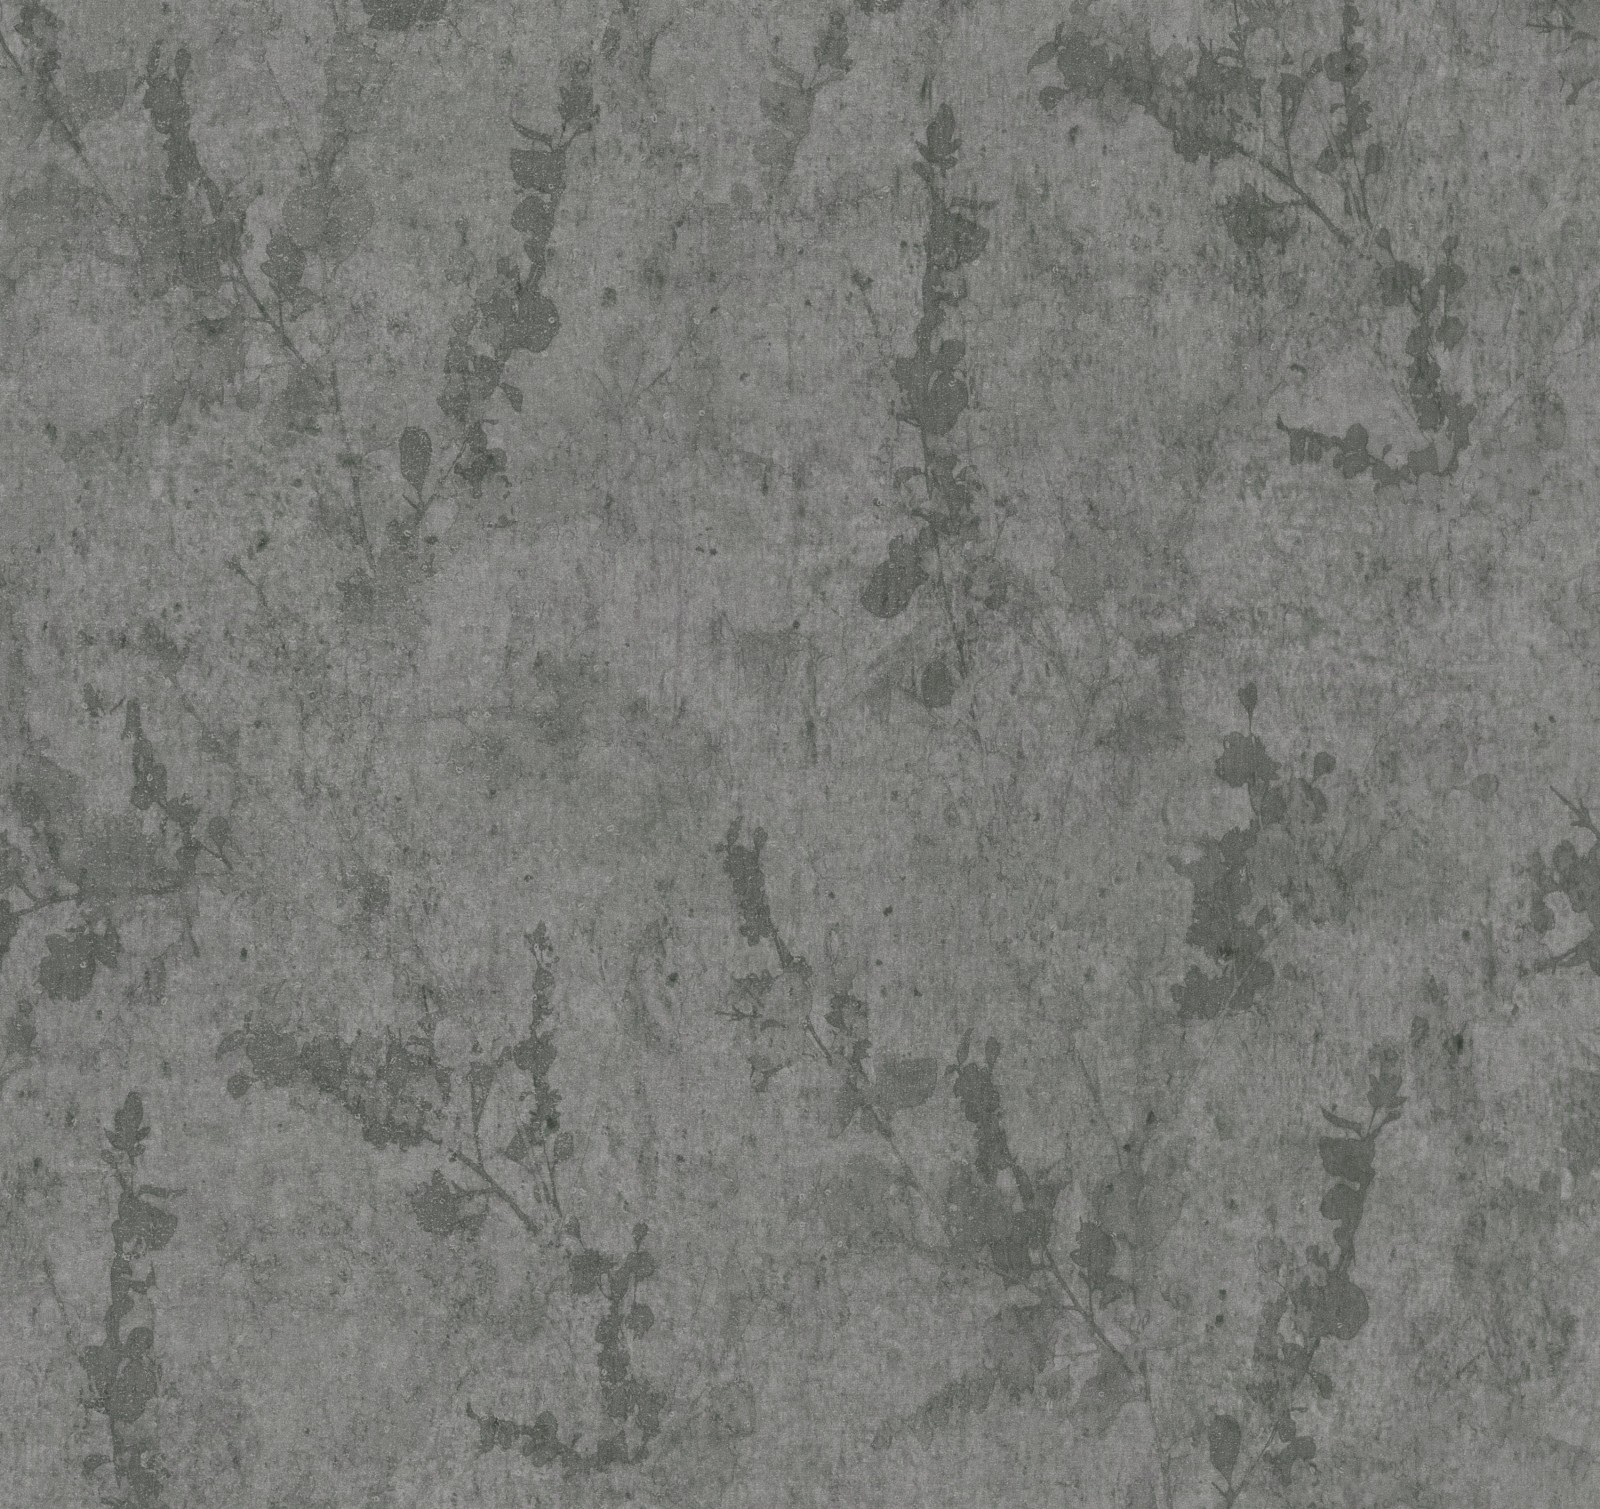 wohnraumgestaltung grau ~ kreative deko-ideen und innenarchitektur - Wohnraumgestaltung Grau